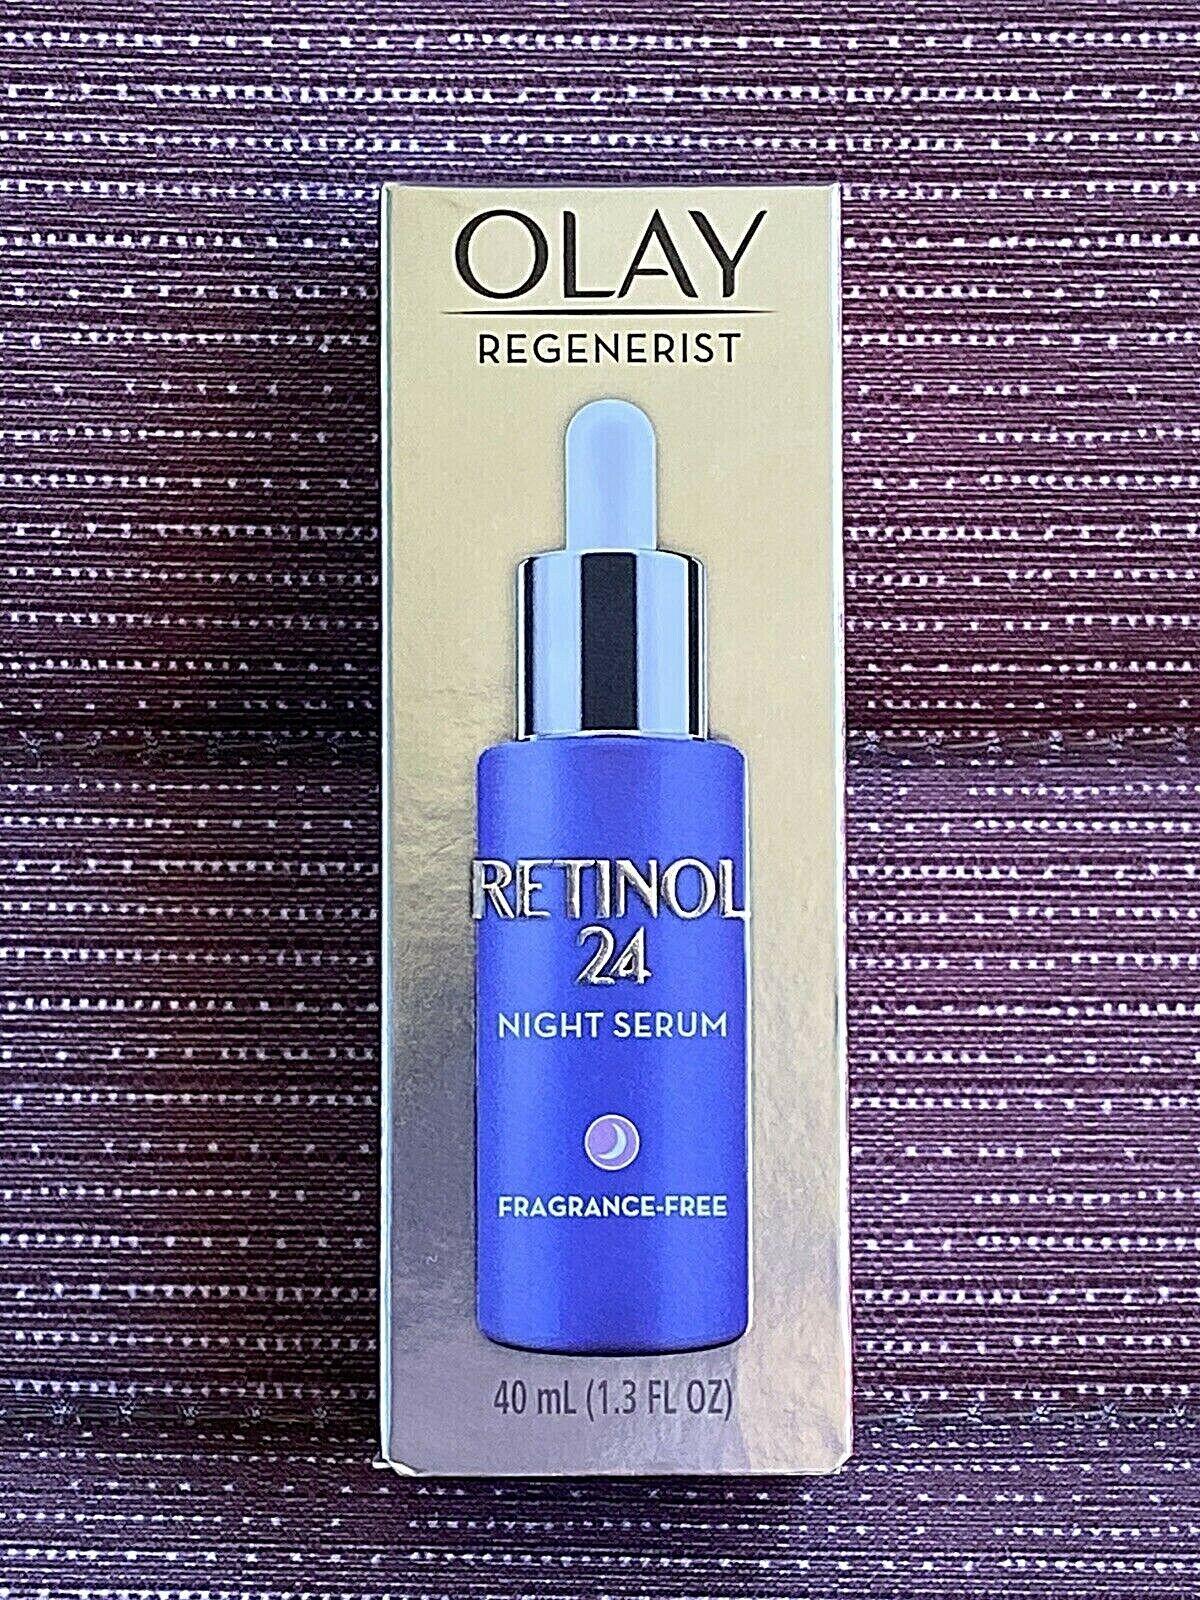 Olay Regenerist Retinol 24 Night Facial Serum 1.3oz SEALED B